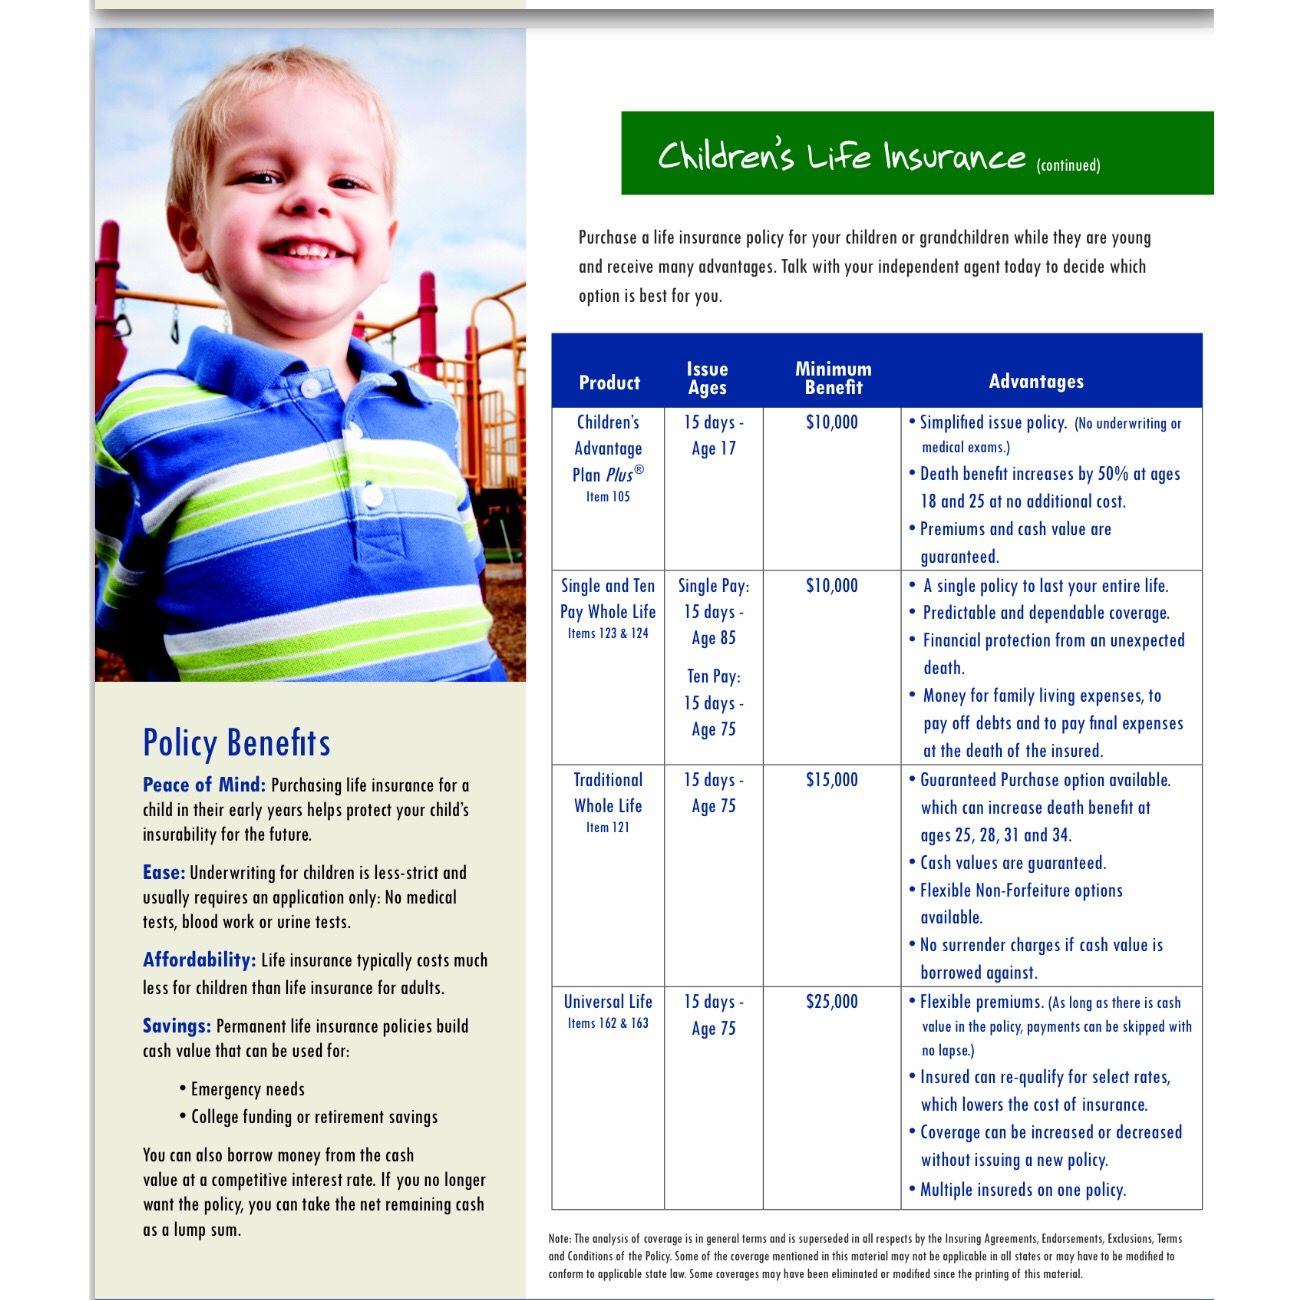 Pin by Tammy Wickham on Insurance Life, Childrens, Insurance